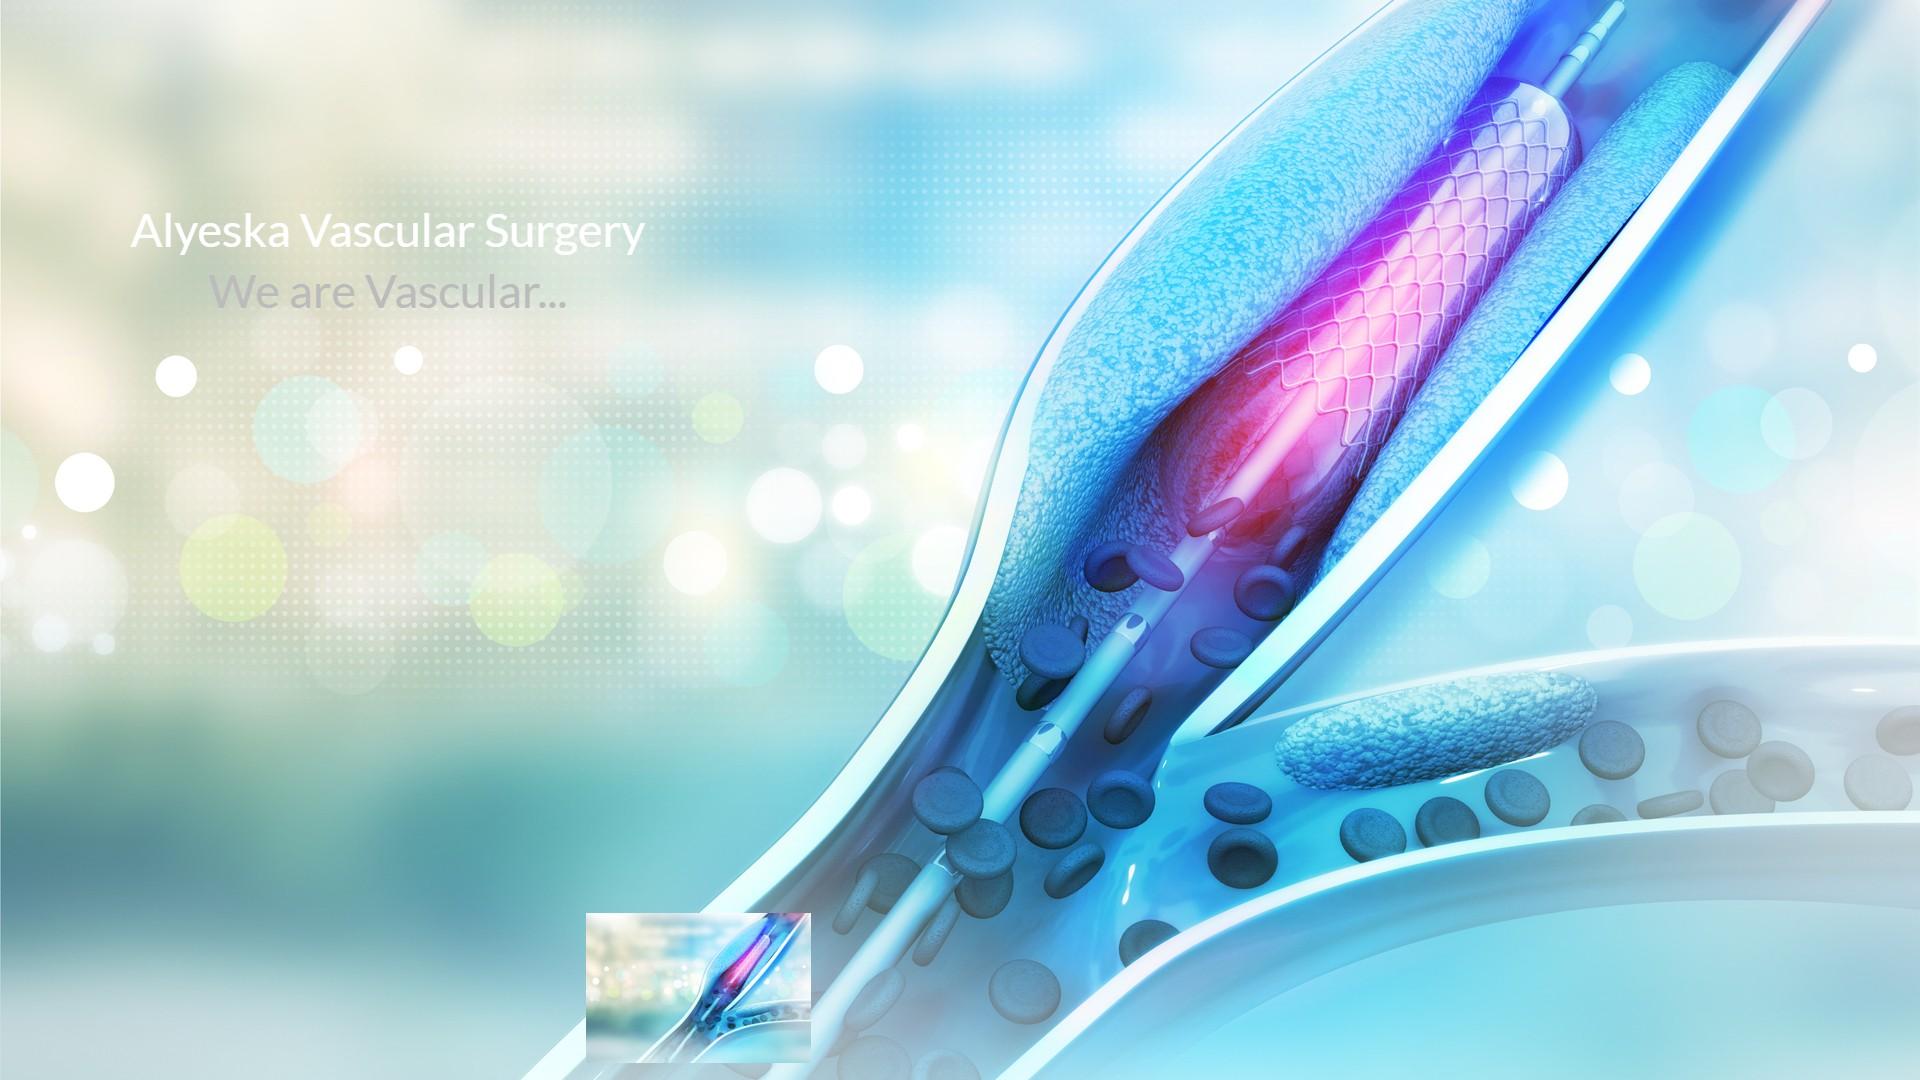 Alyeska Vascular Surgery LLC | LinkedIn